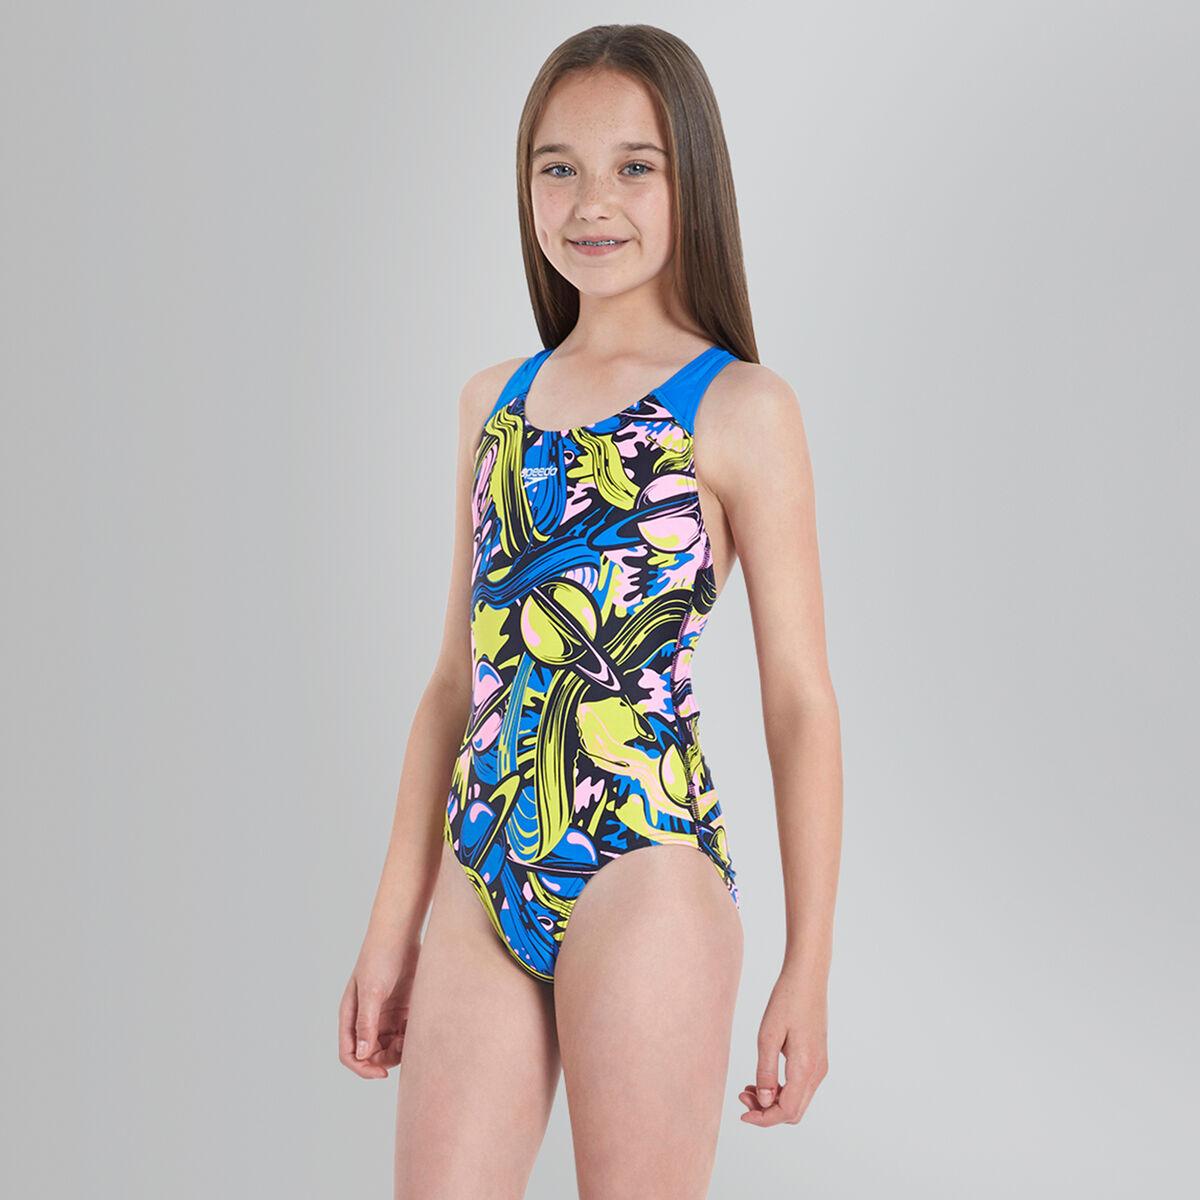 Splashback Swimsuit